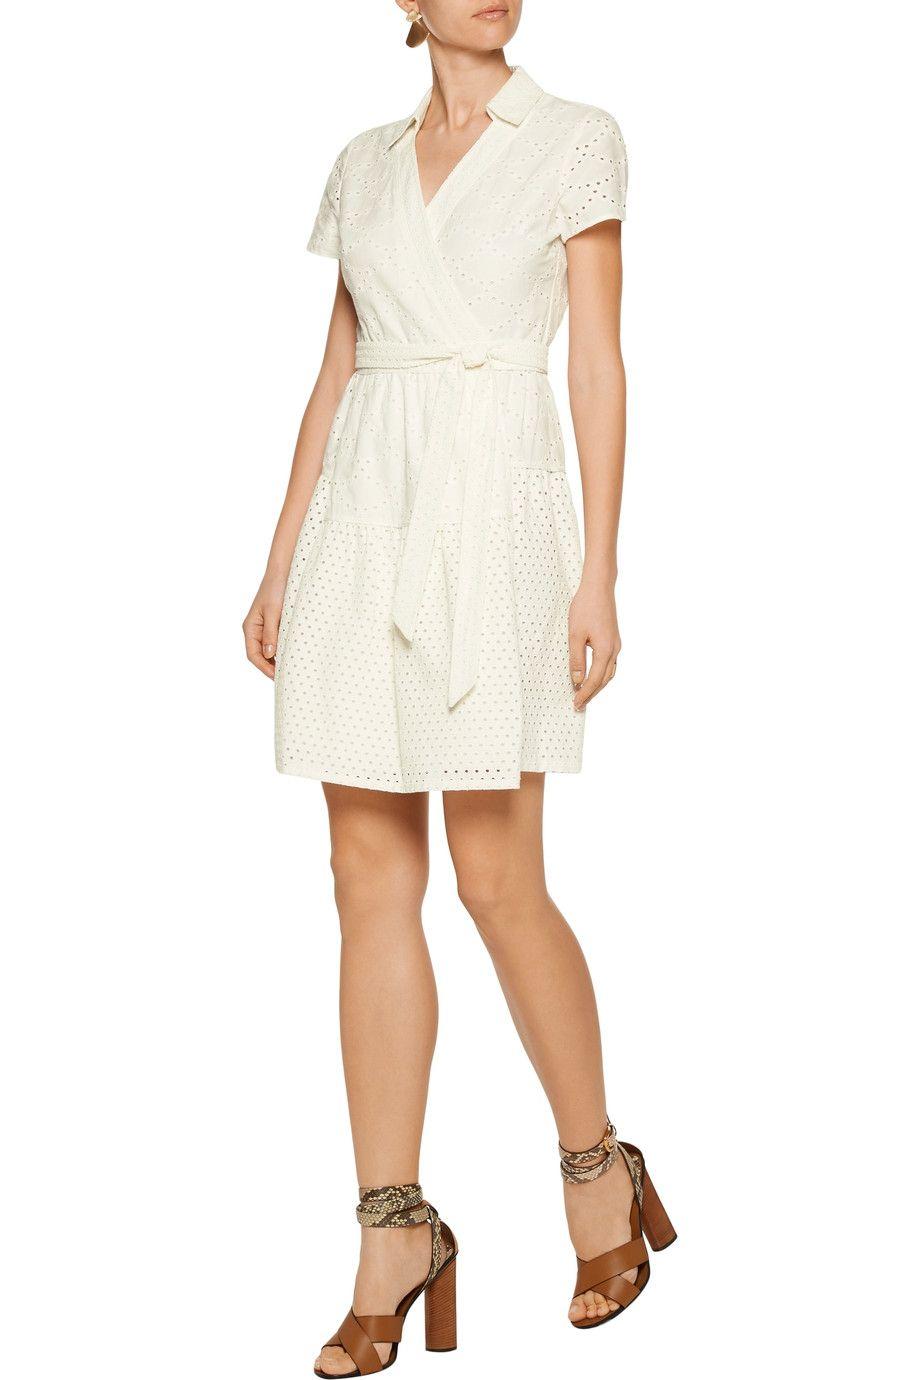 Shop On Sale Diane Von Furstenberg Kaley Wrap Effect Broderie Anglaise Cotton Dress Browse Other Discount Designer Dr Diane Von Furstenberg Wrap Dress Fashion [ 1380 x 920 Pixel ]